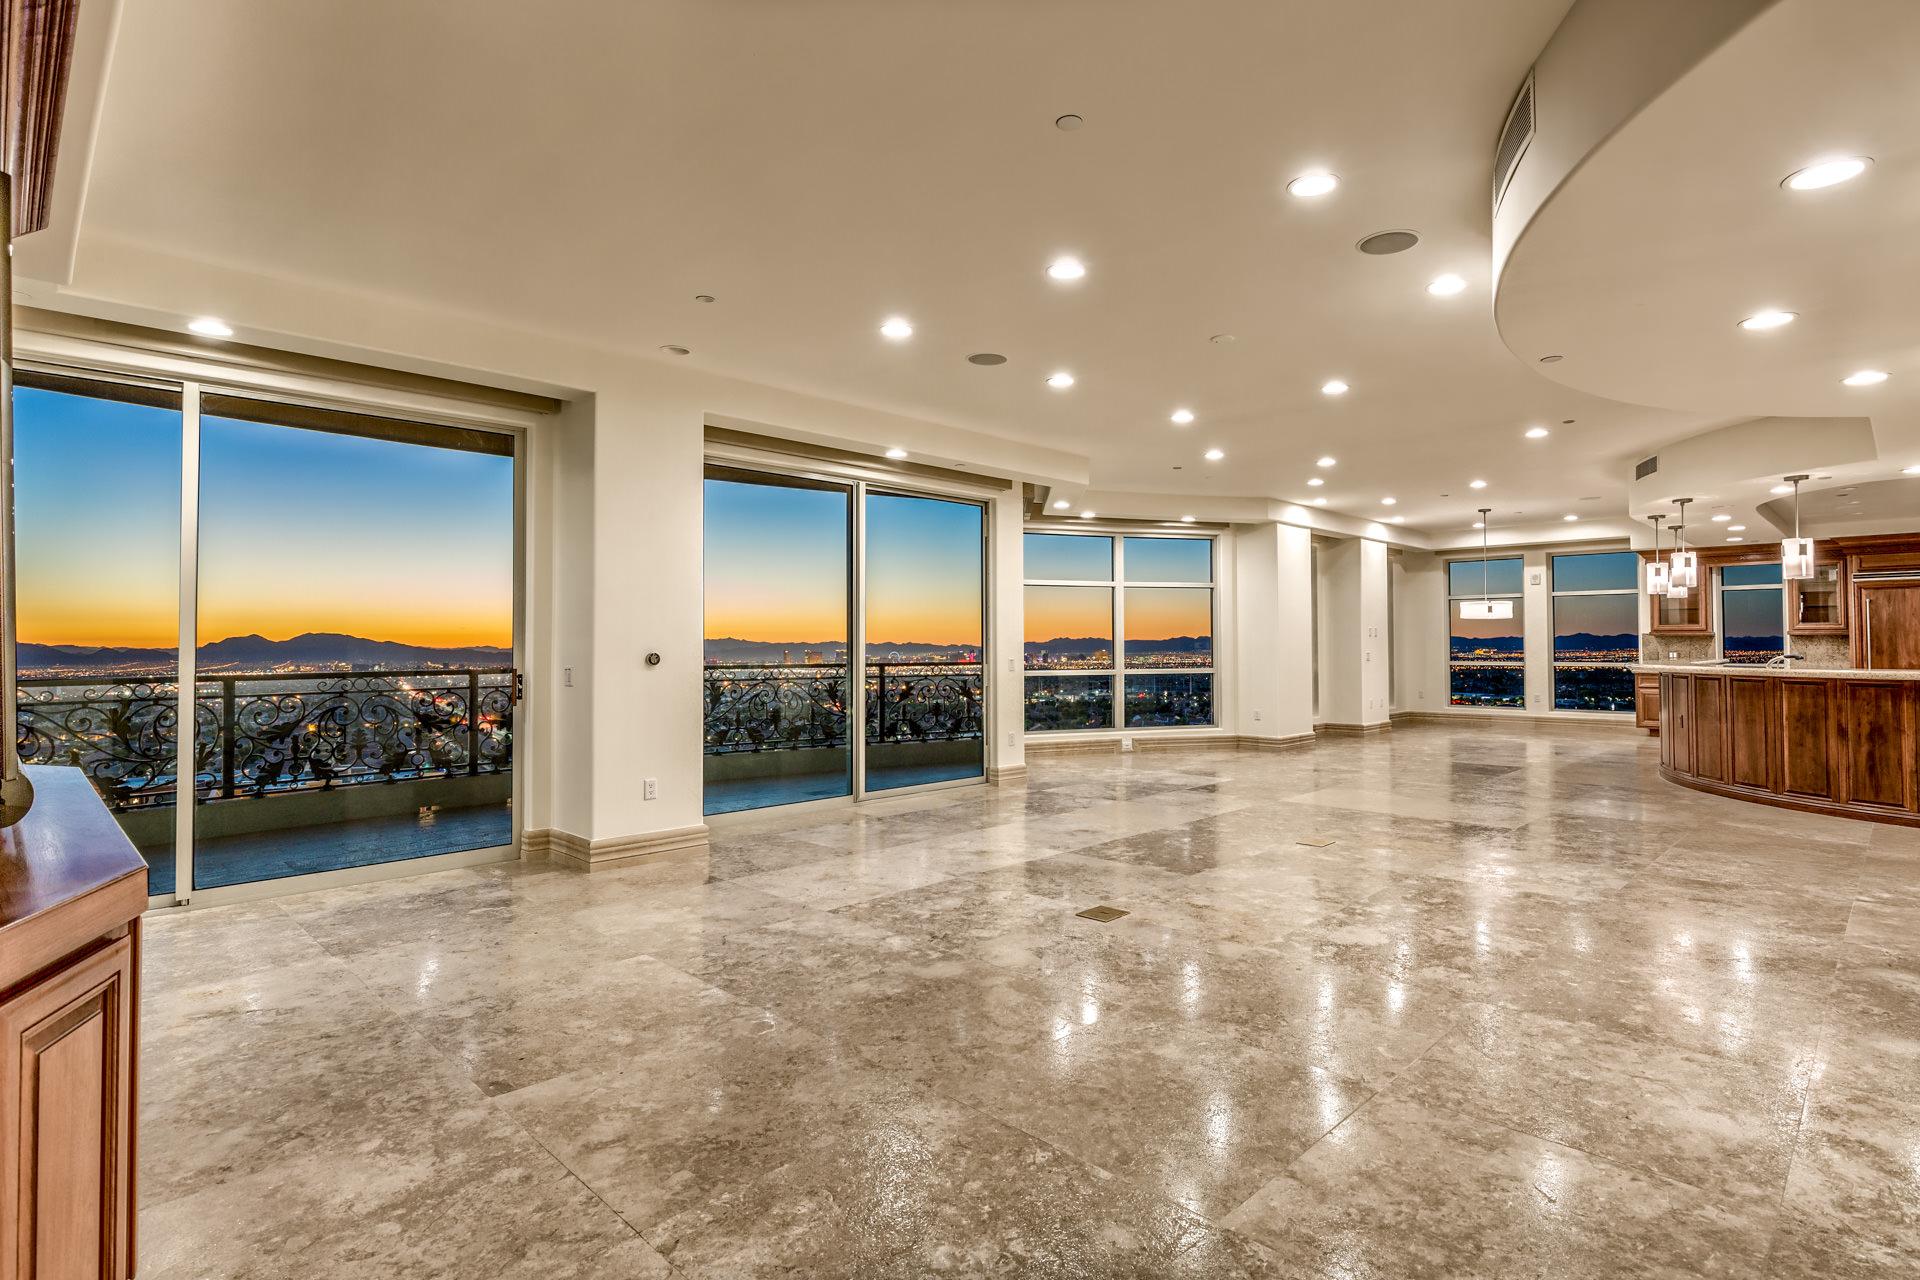 Vegas seven magazine october 2016 luxury homes las vegas for Luxury homes las vegas for sale